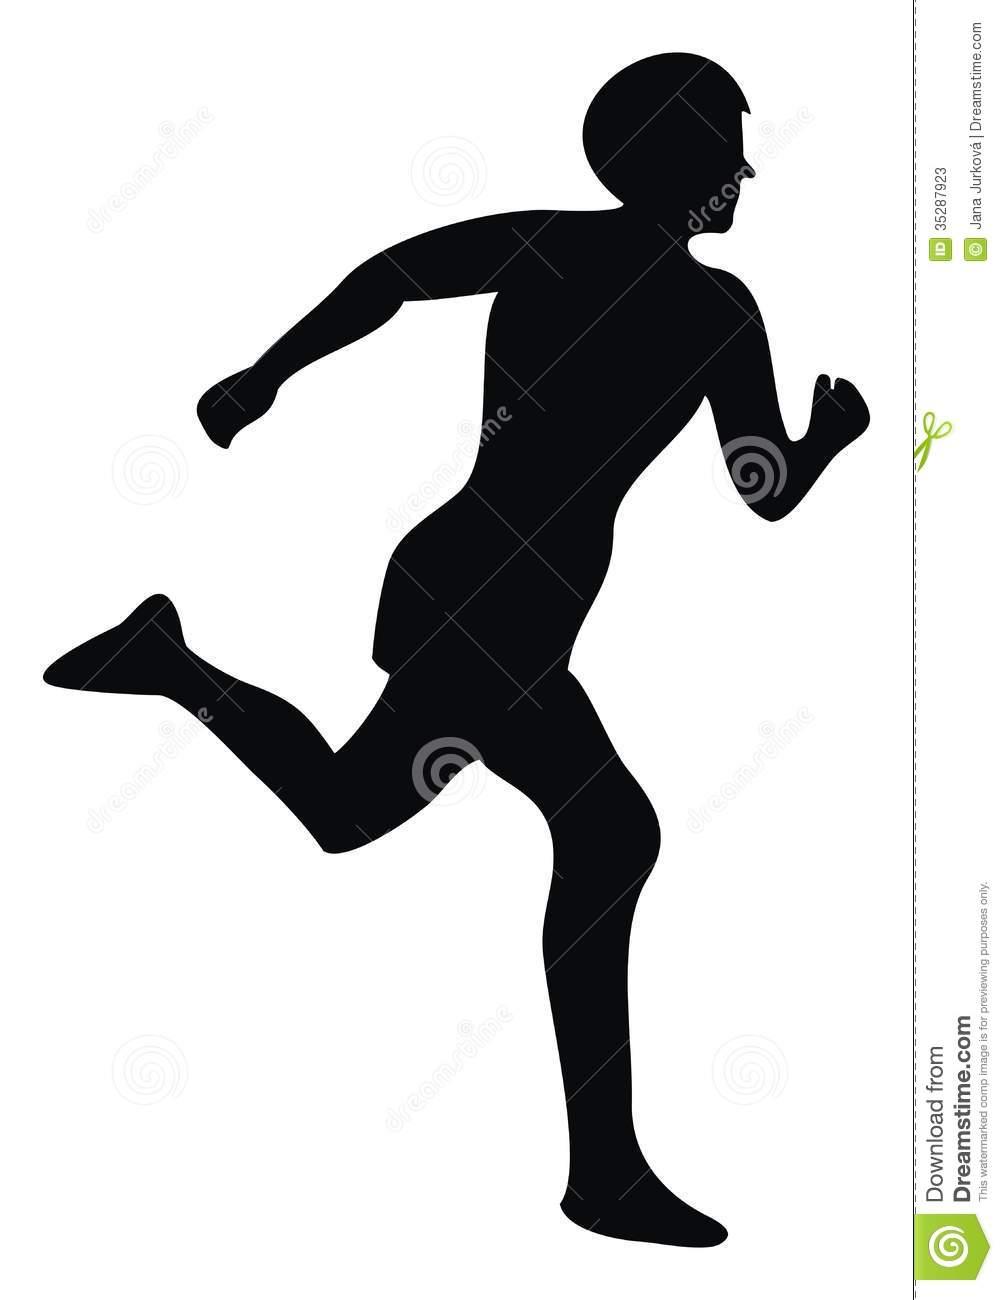 clipart runner free - photo #41